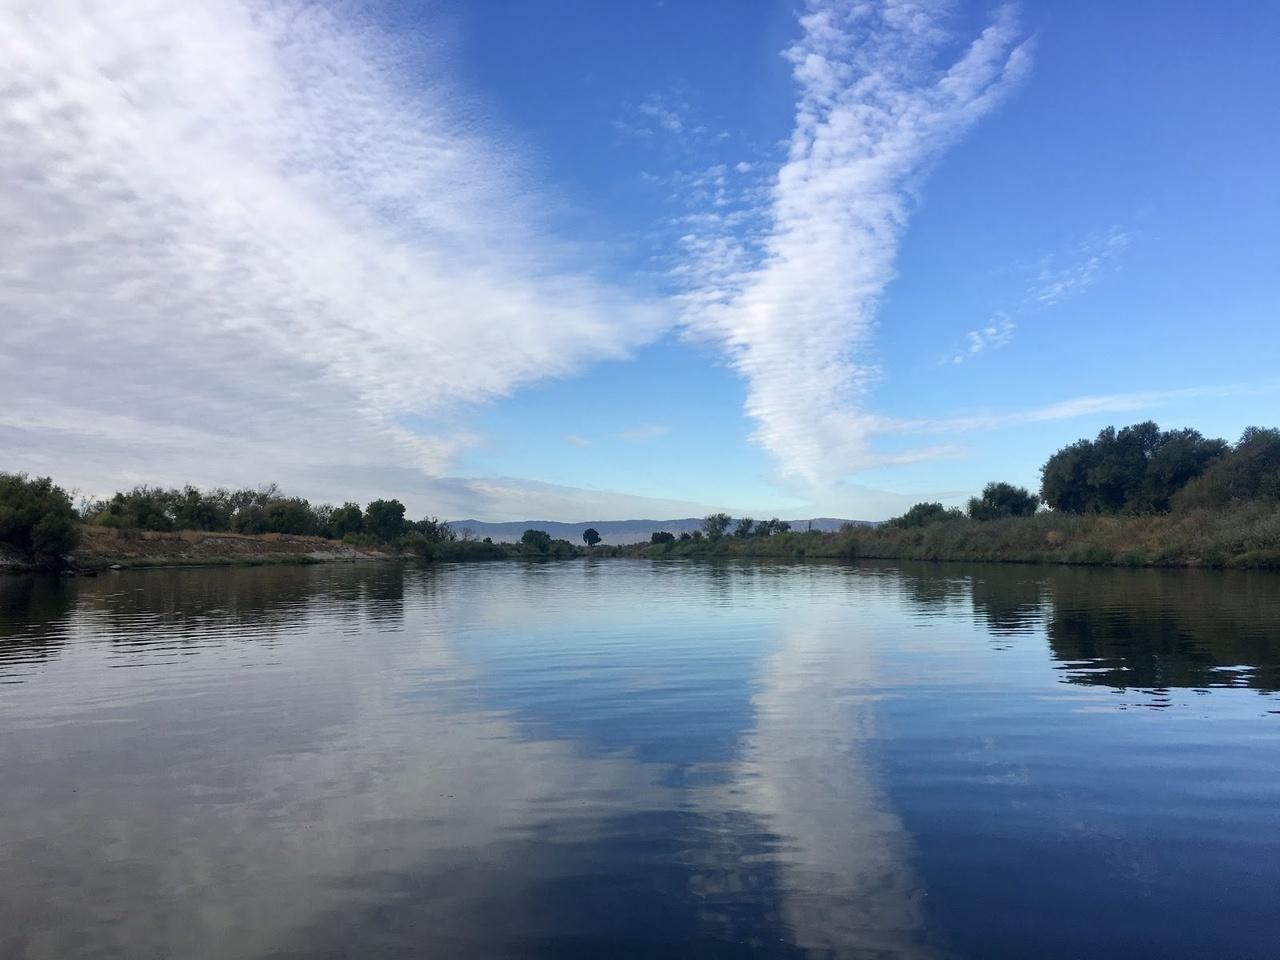 Lower San Joaquin River